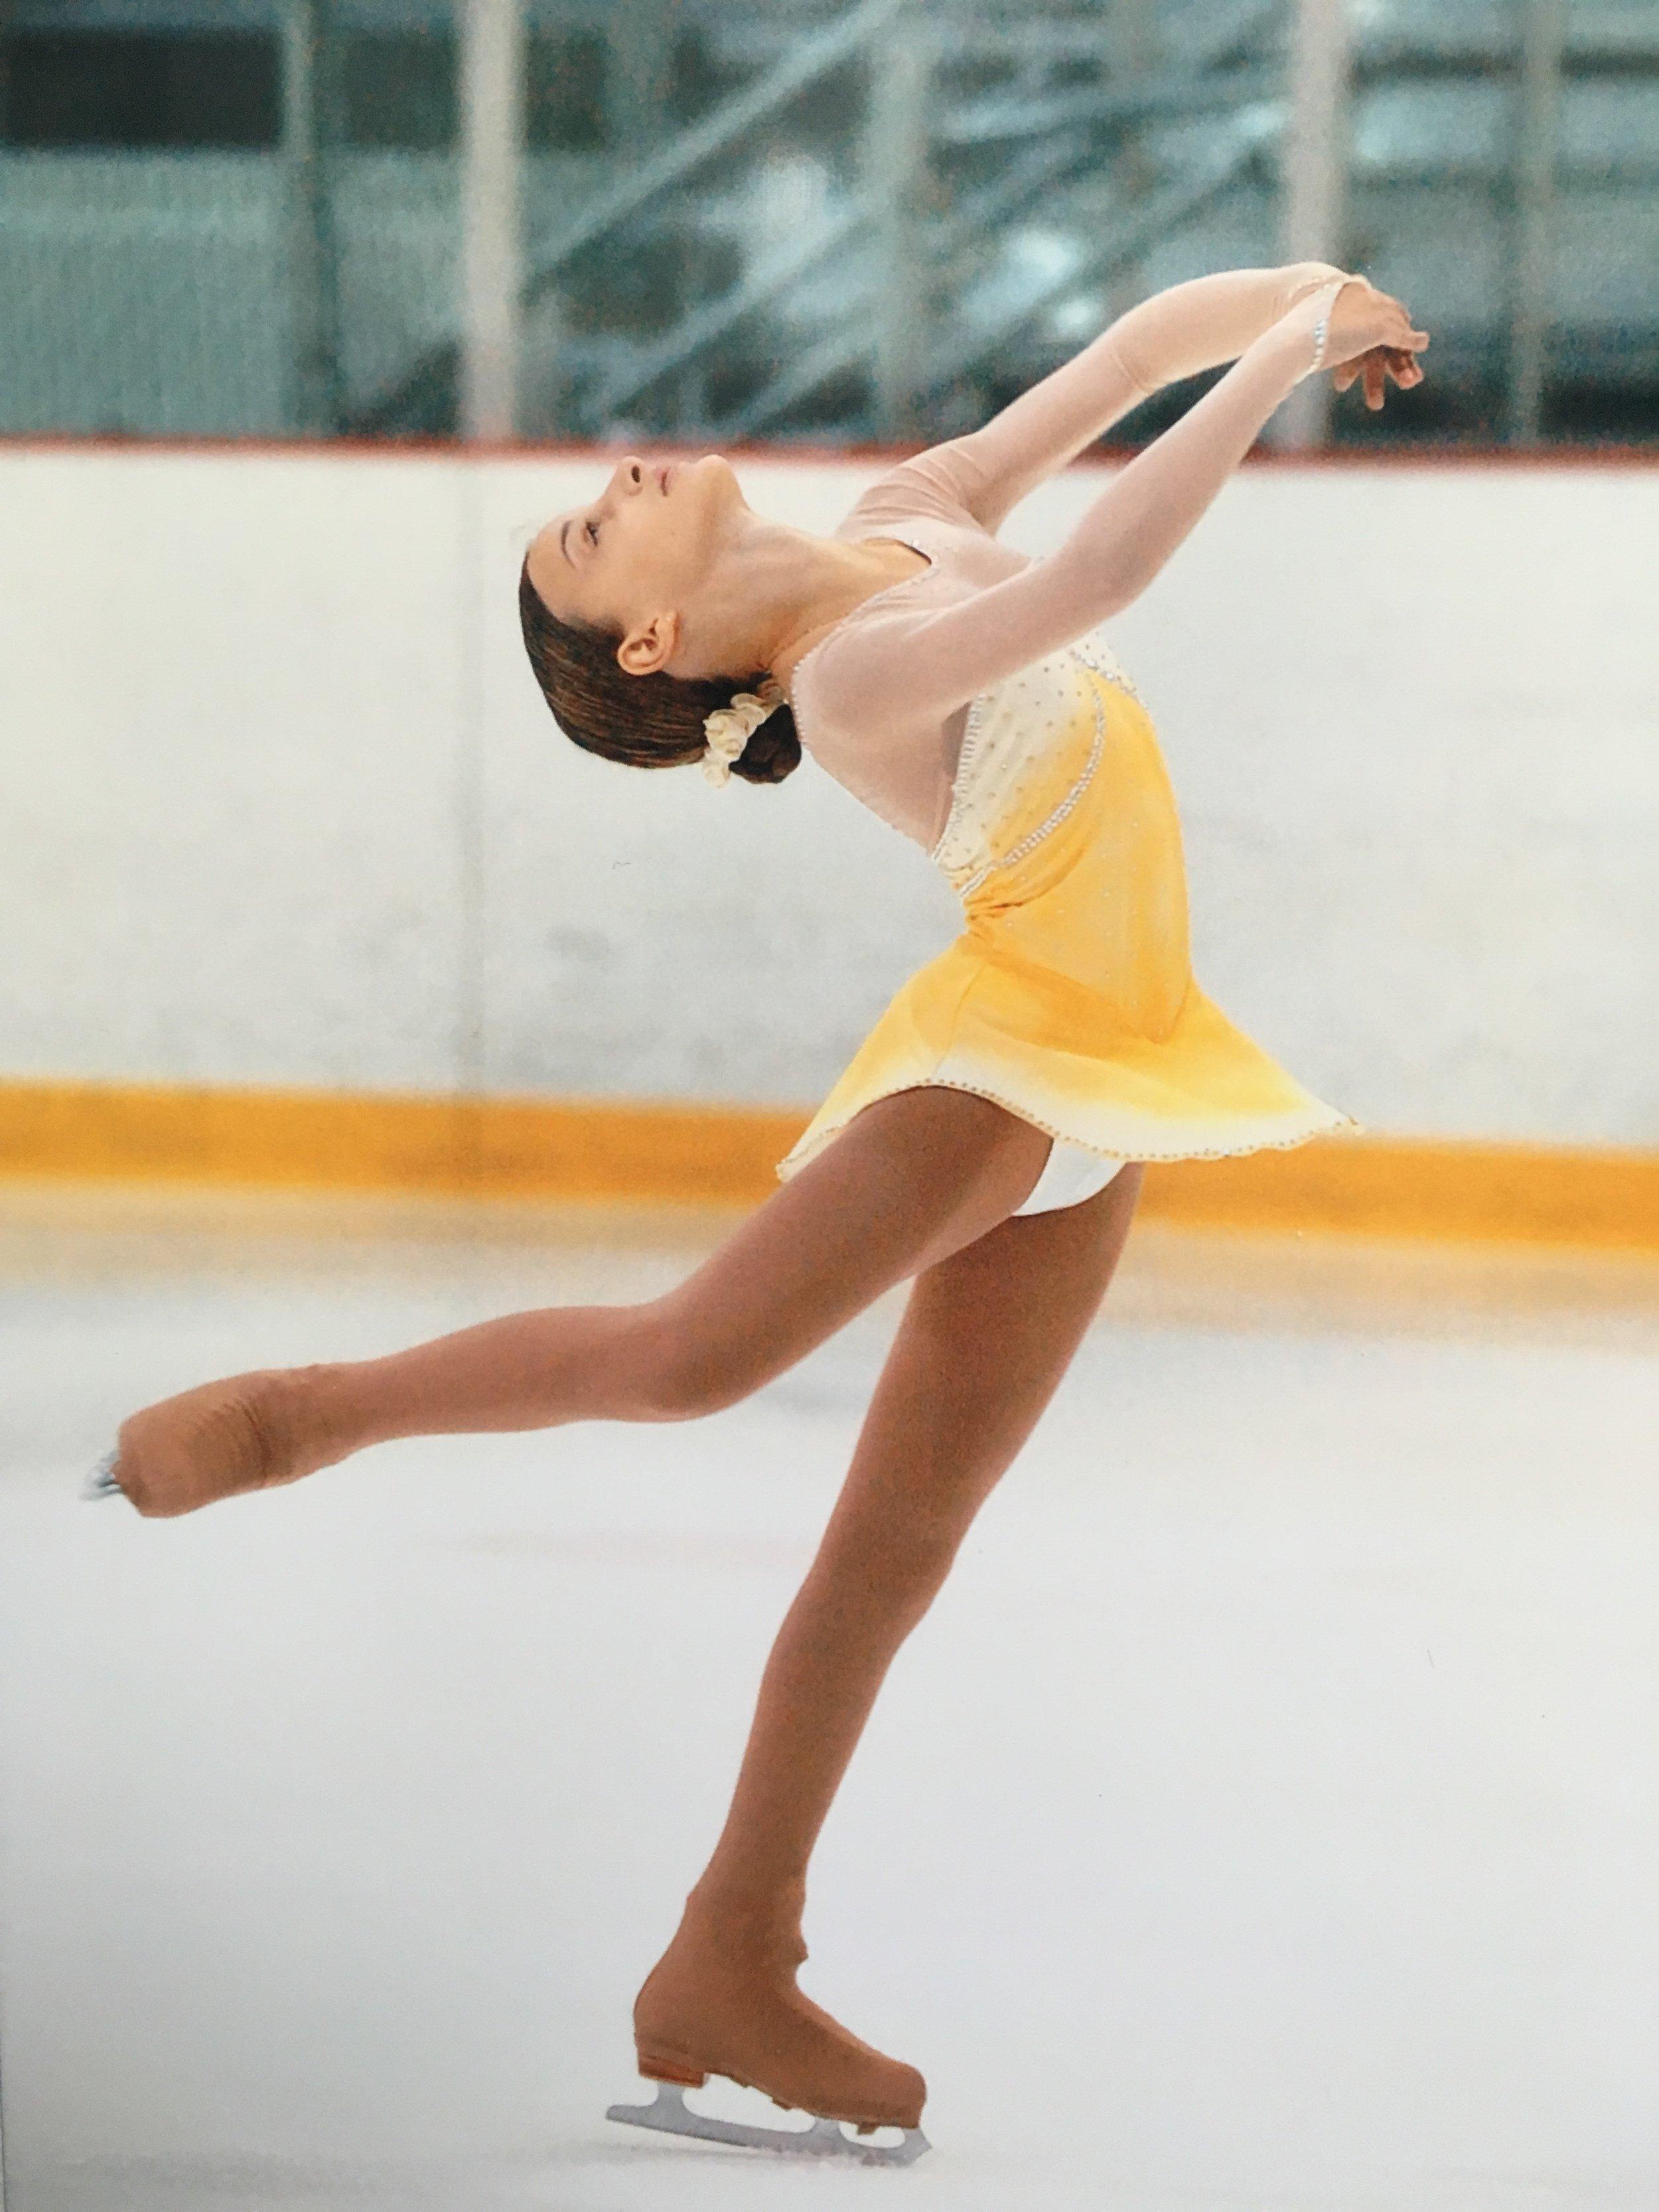 Laura_Snyderman_skating1.jpg